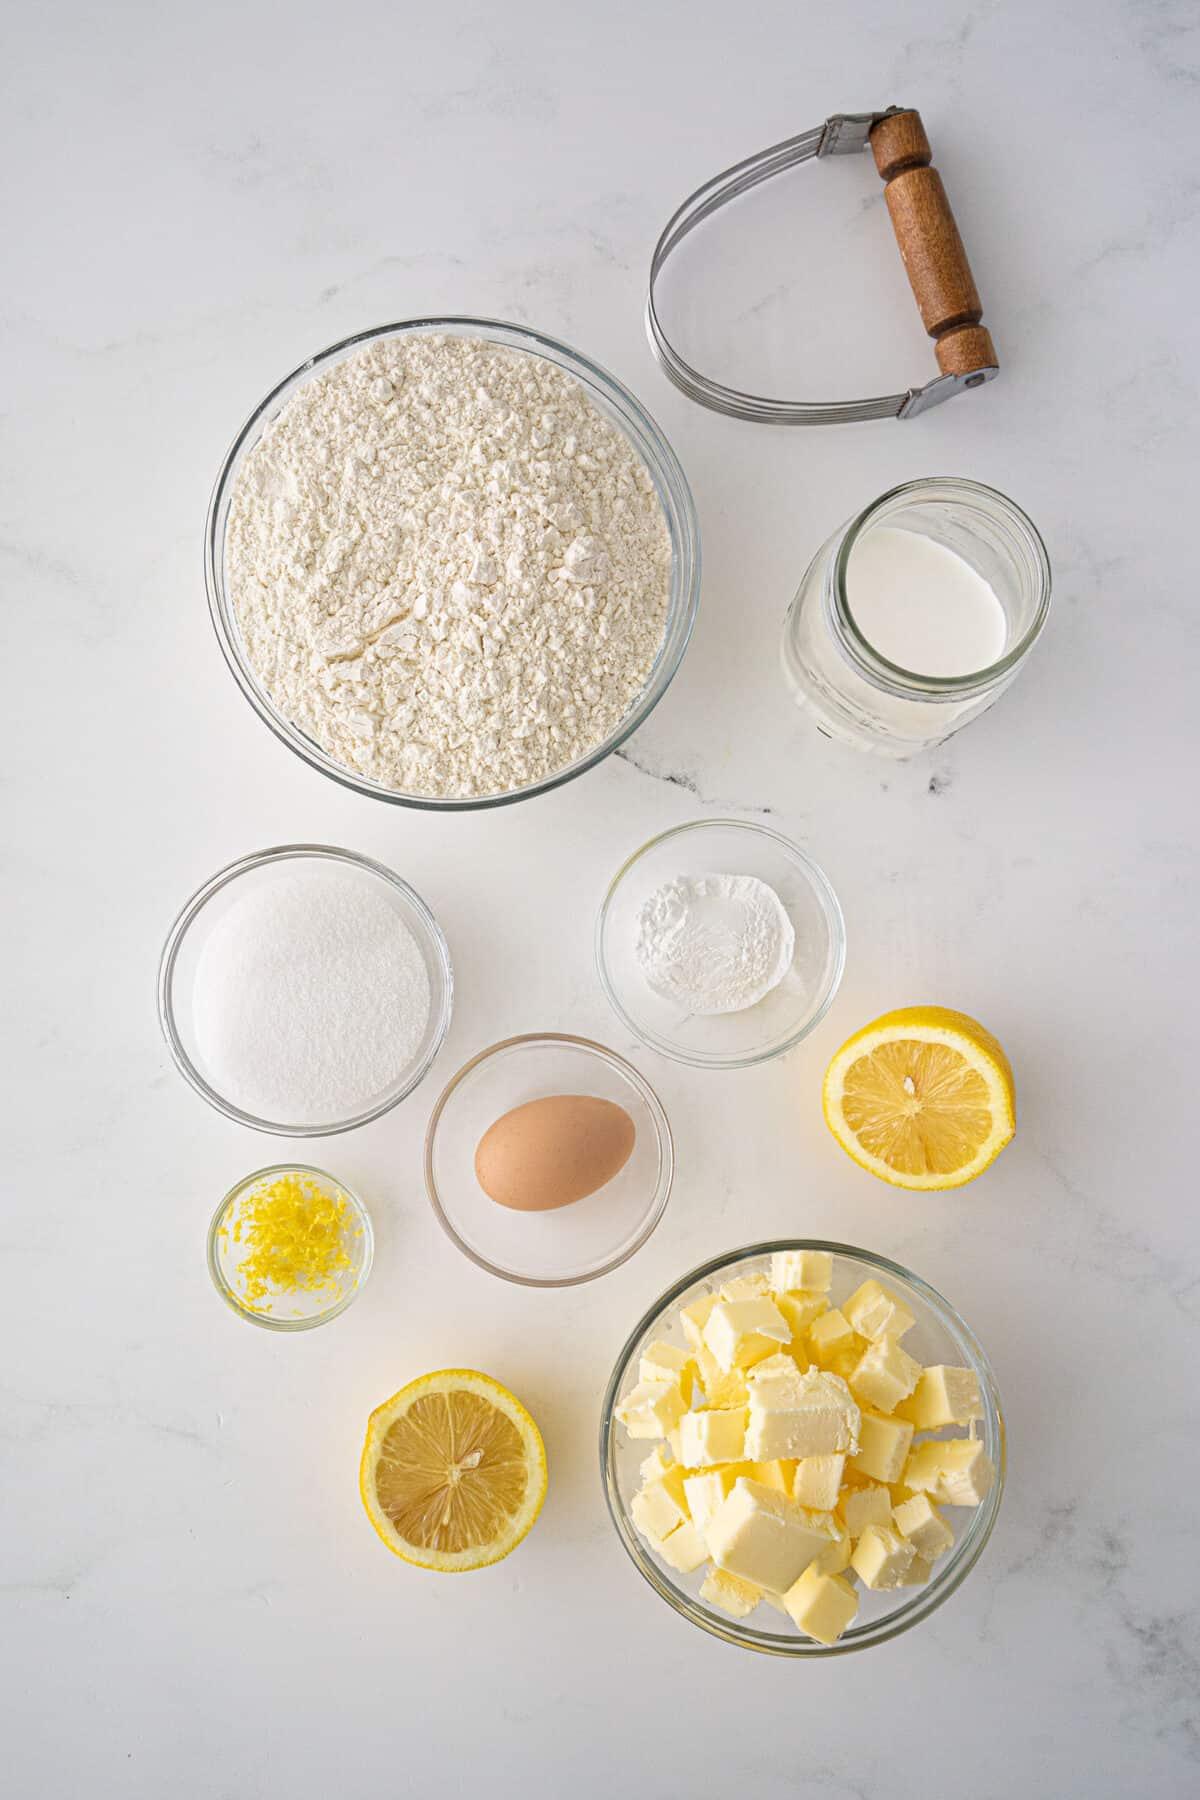 ingredients for lemon scones